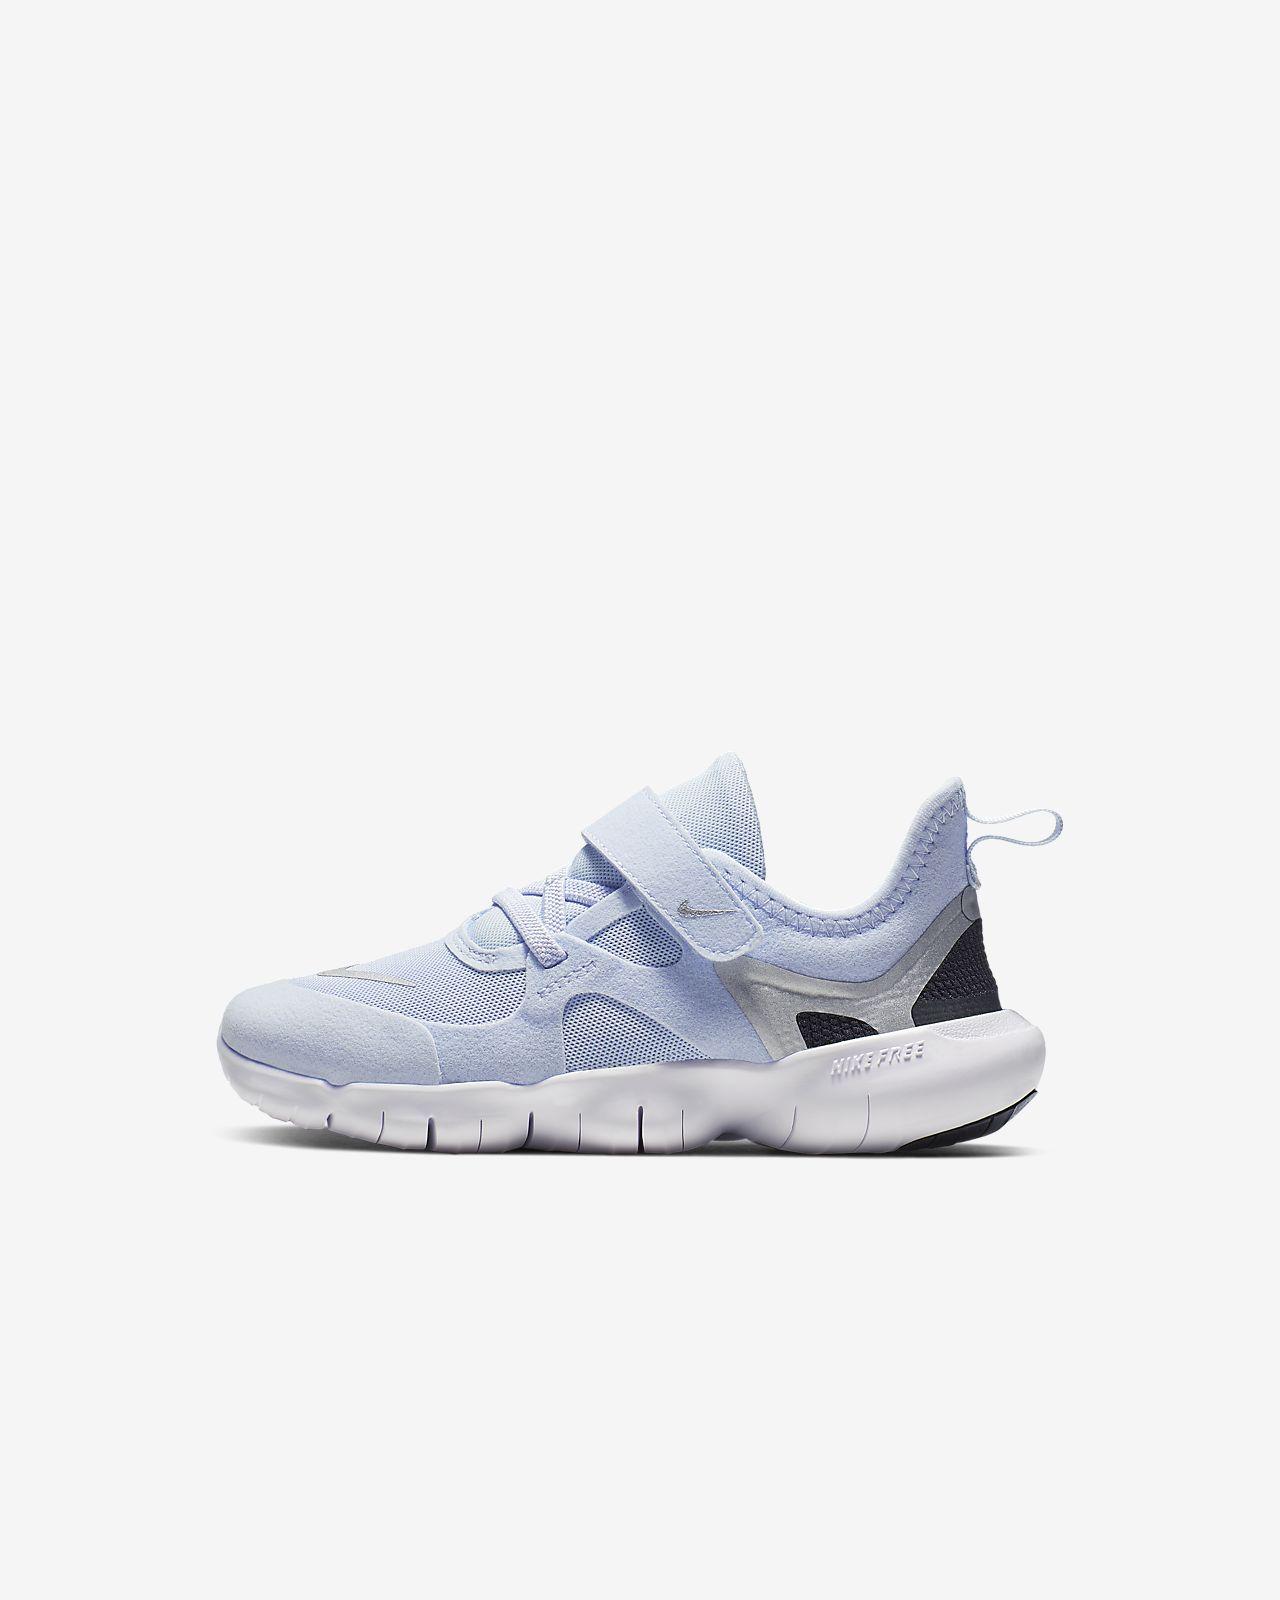 Nike Free RN 5.0 (PSV) 幼童运动童鞋